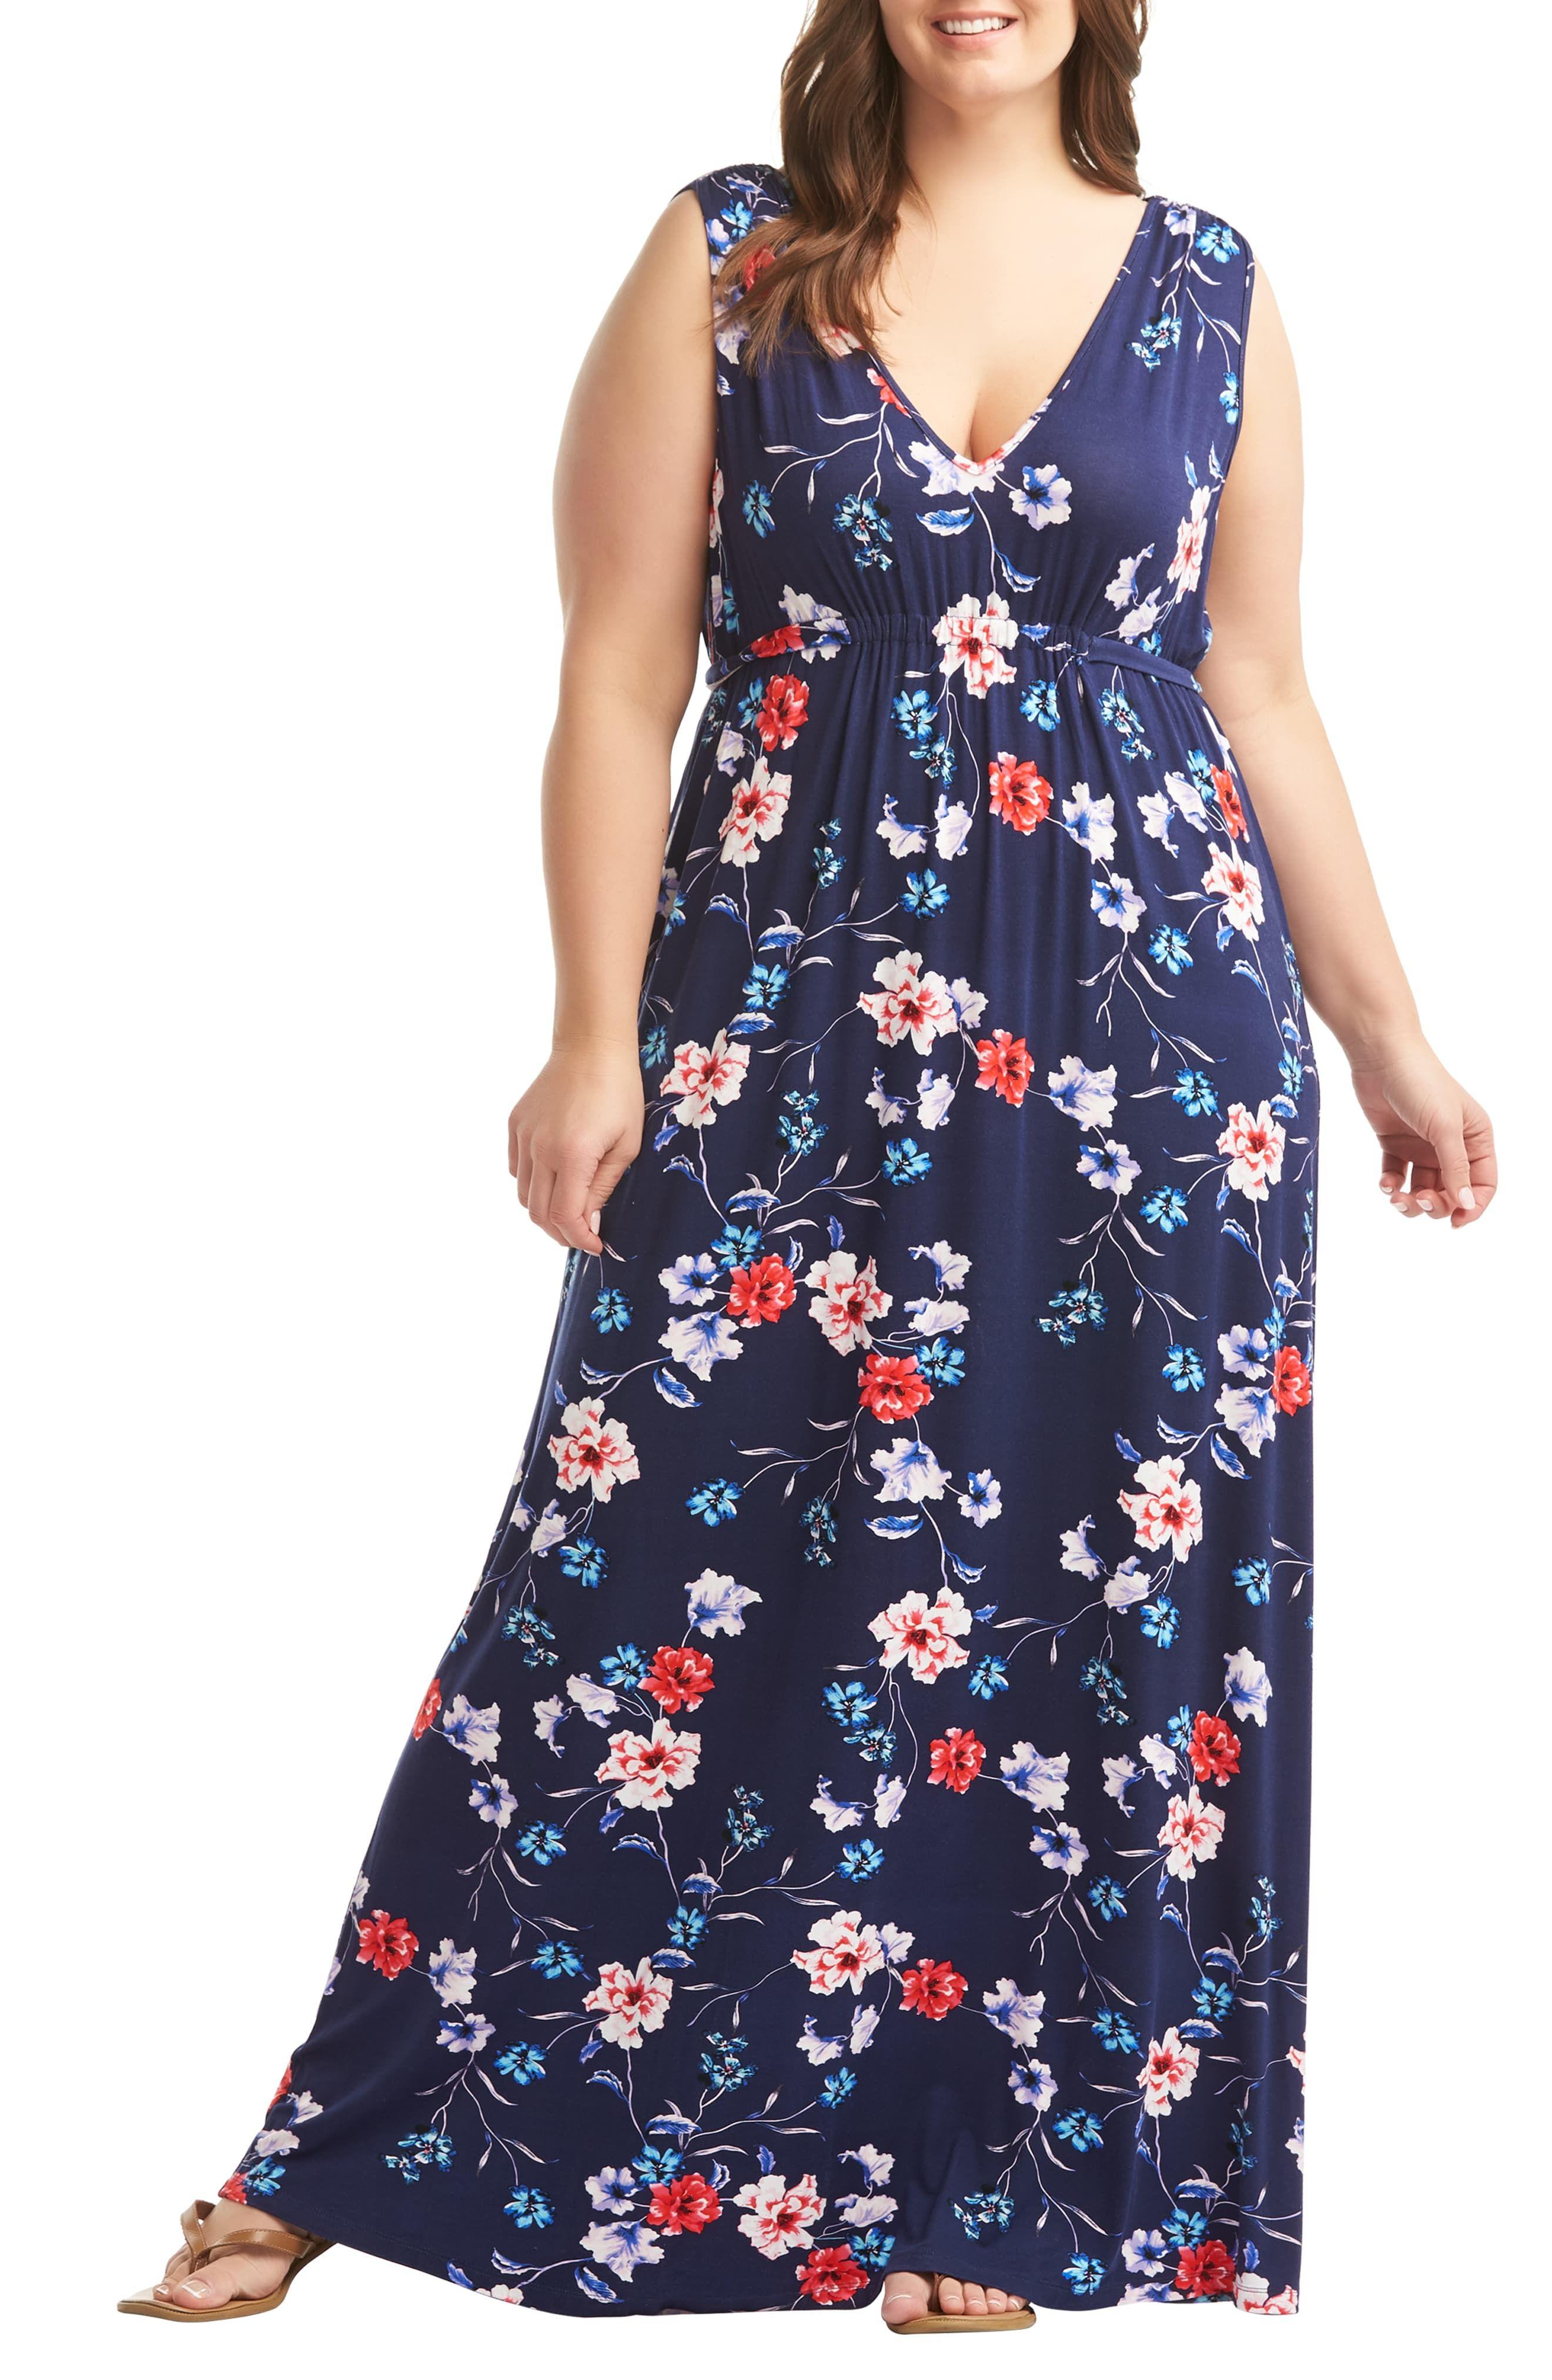 Lemon Tart Grecia Maxi Dress Plus Size Nordstrom Maxi Dress Womens Maxi Dresses Plus Size Maxi Dresses [ 4048 x 2640 Pixel ]